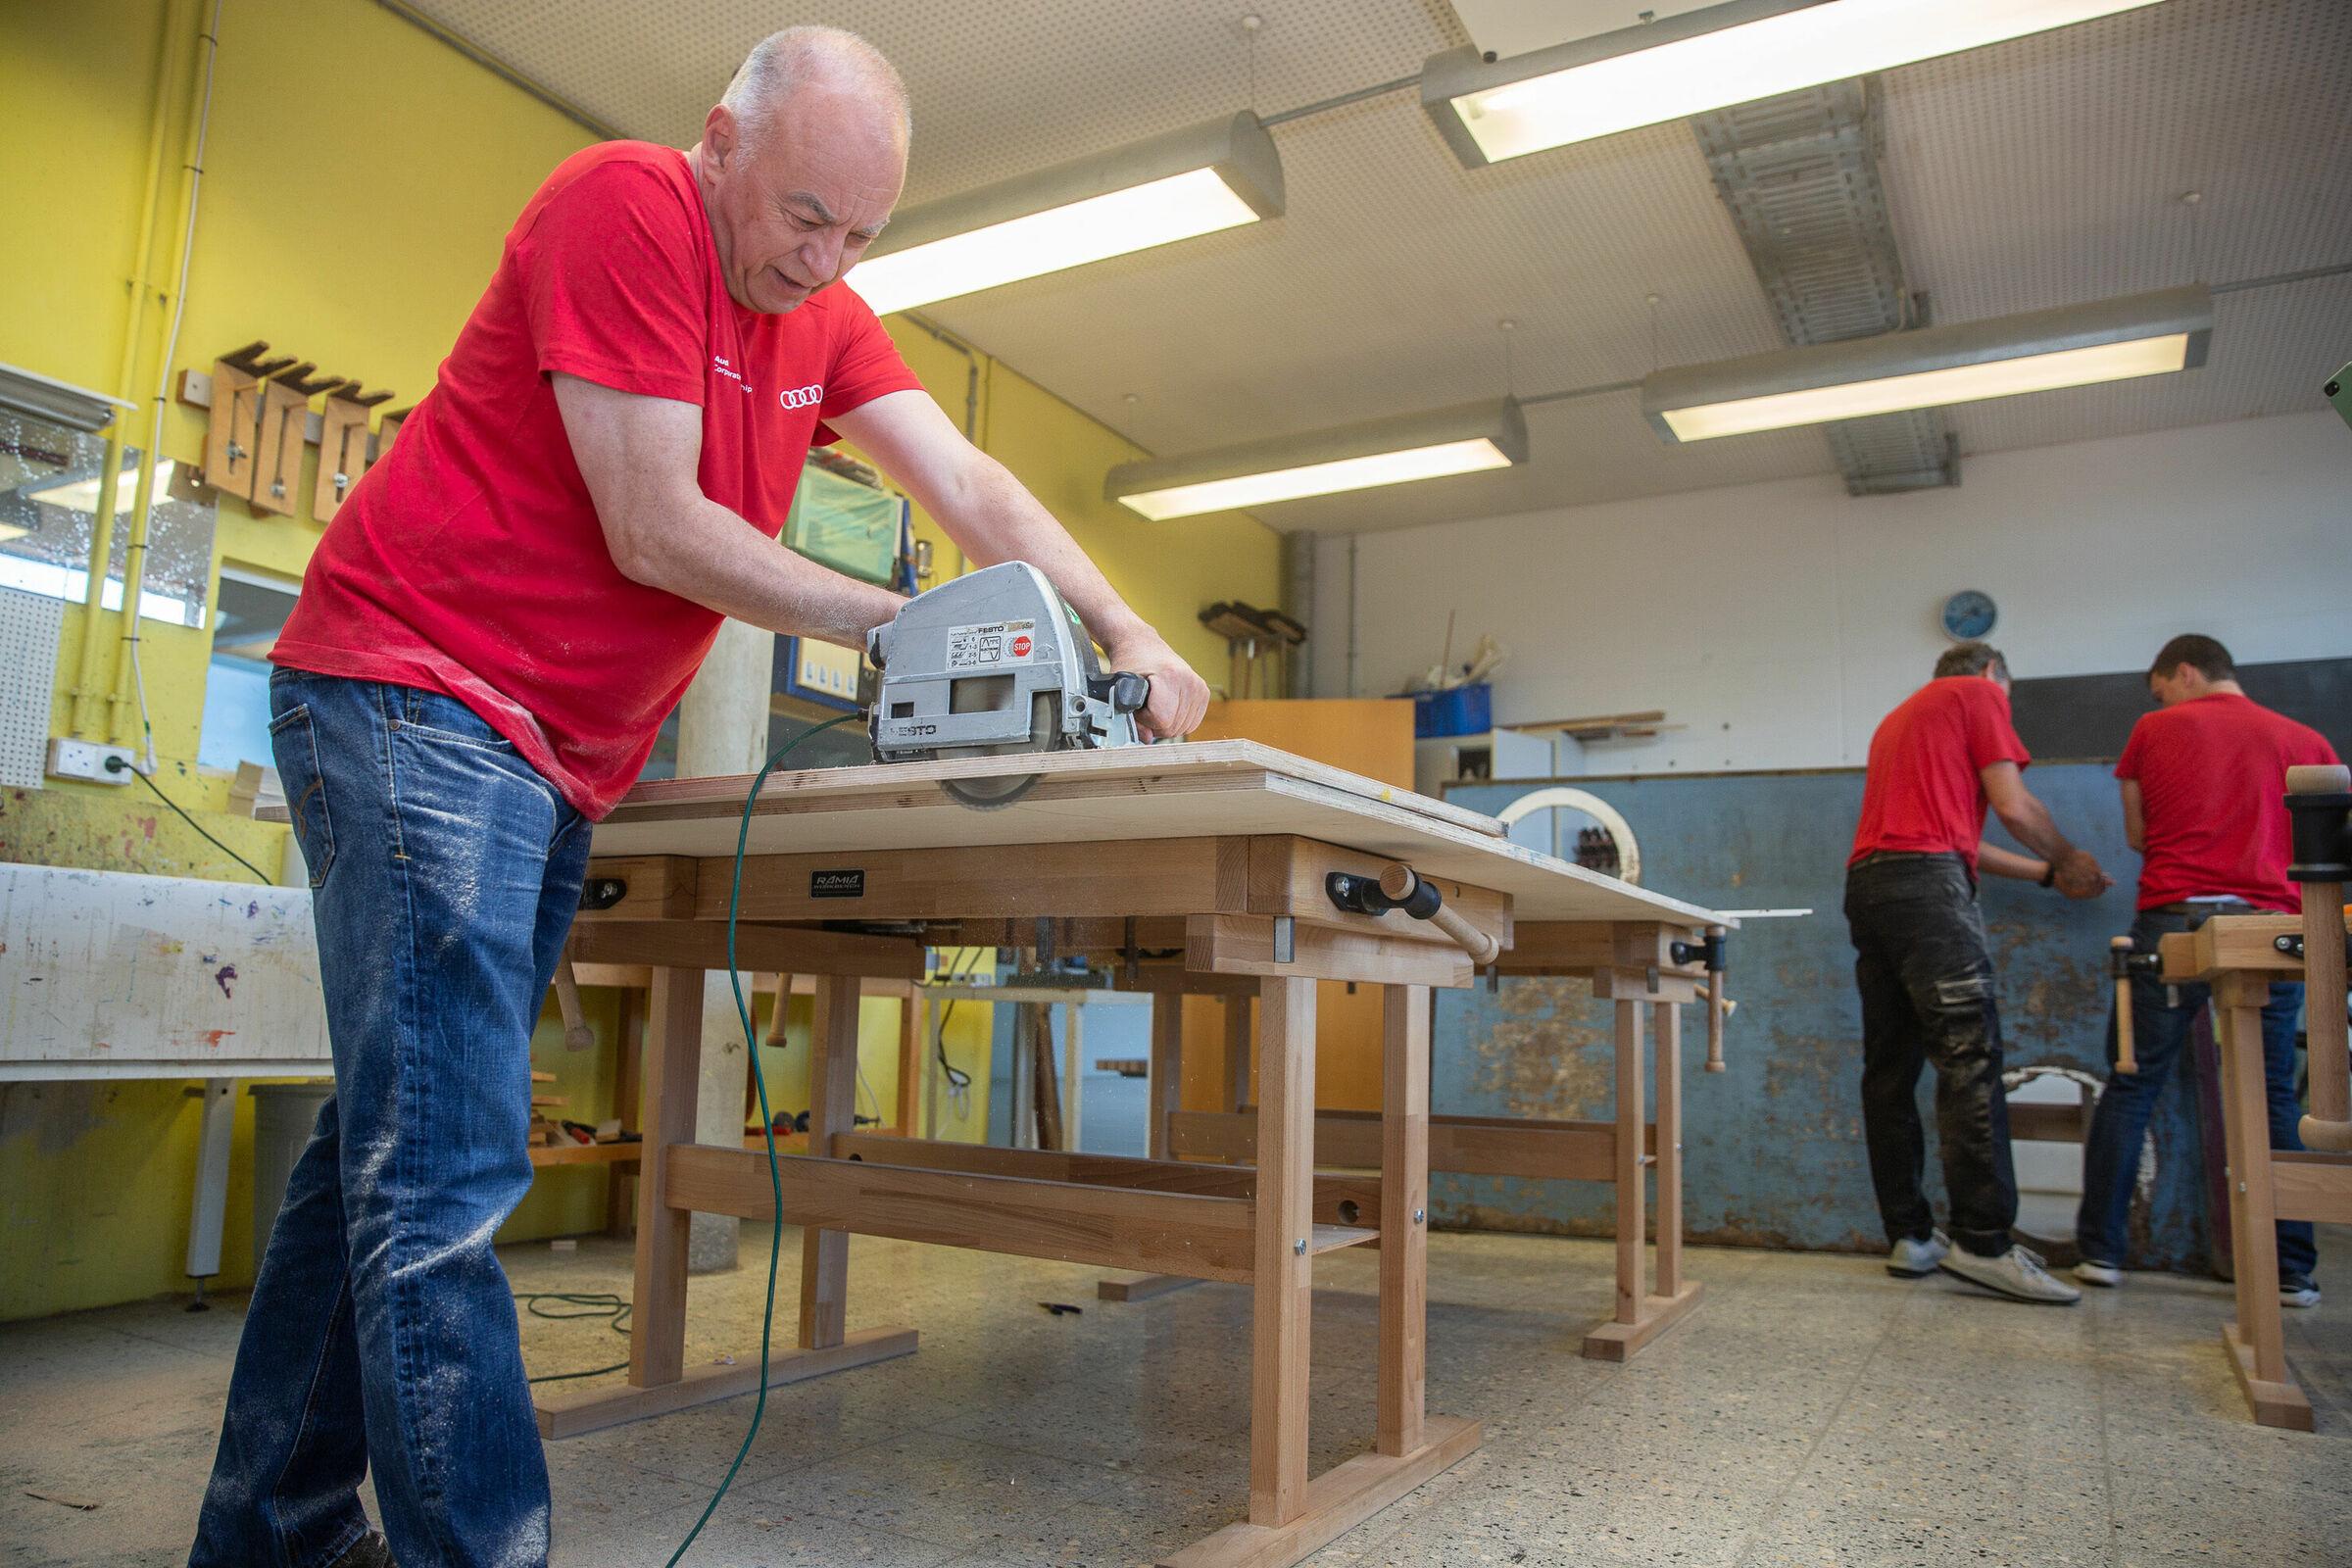 Audi Volunteer Day 2021, digital and analog: employees help in Ingolstadt and Neckarsulm - Image 4